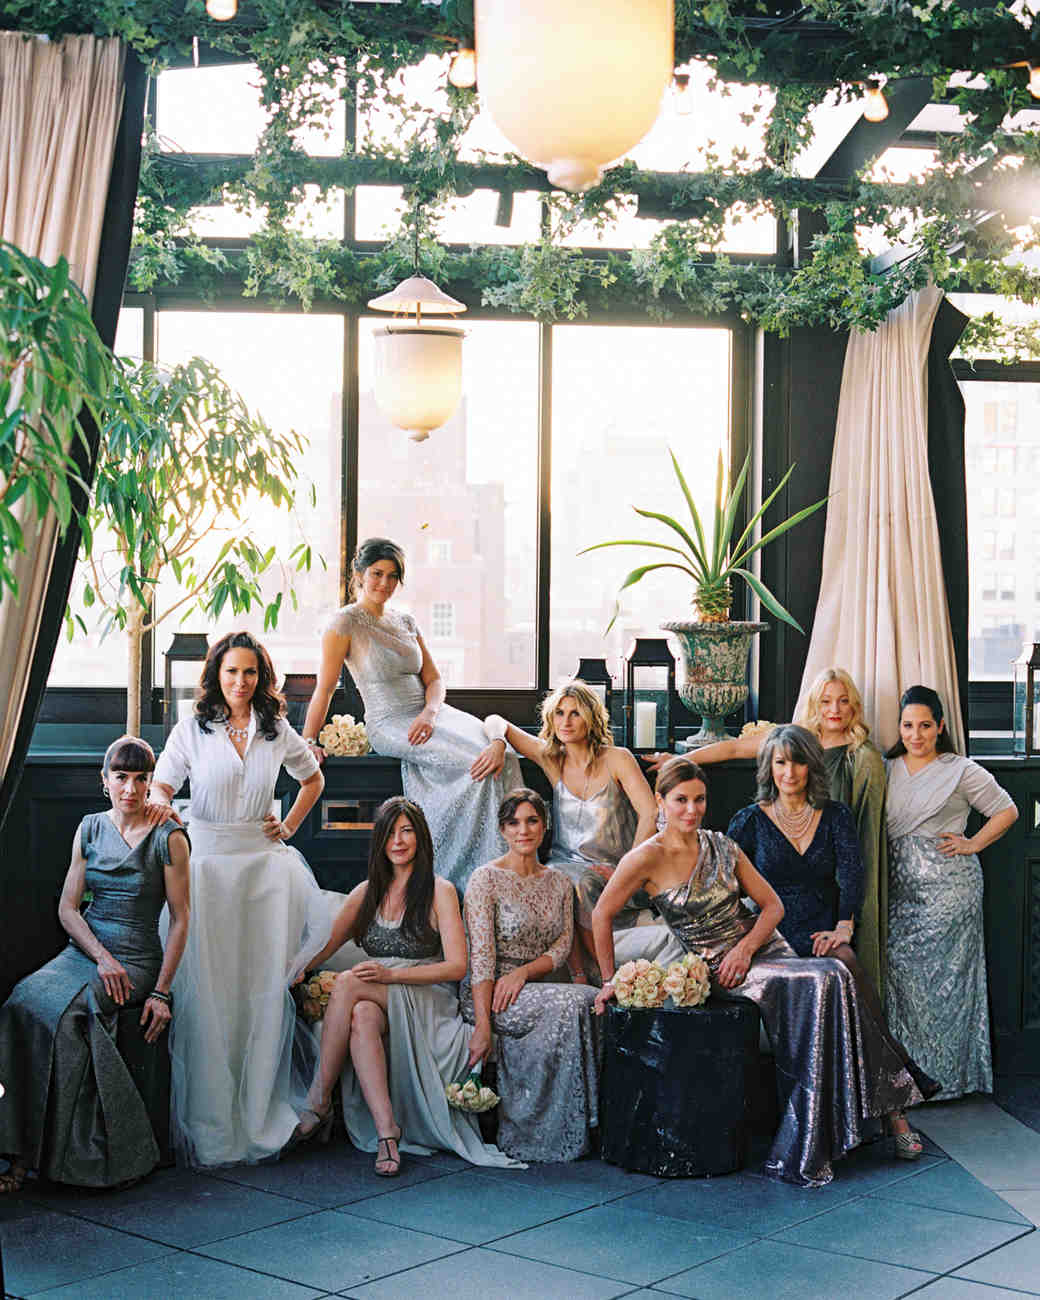 lori-jan-wedding-bridesmaids-00227-s112305-1215.jpg